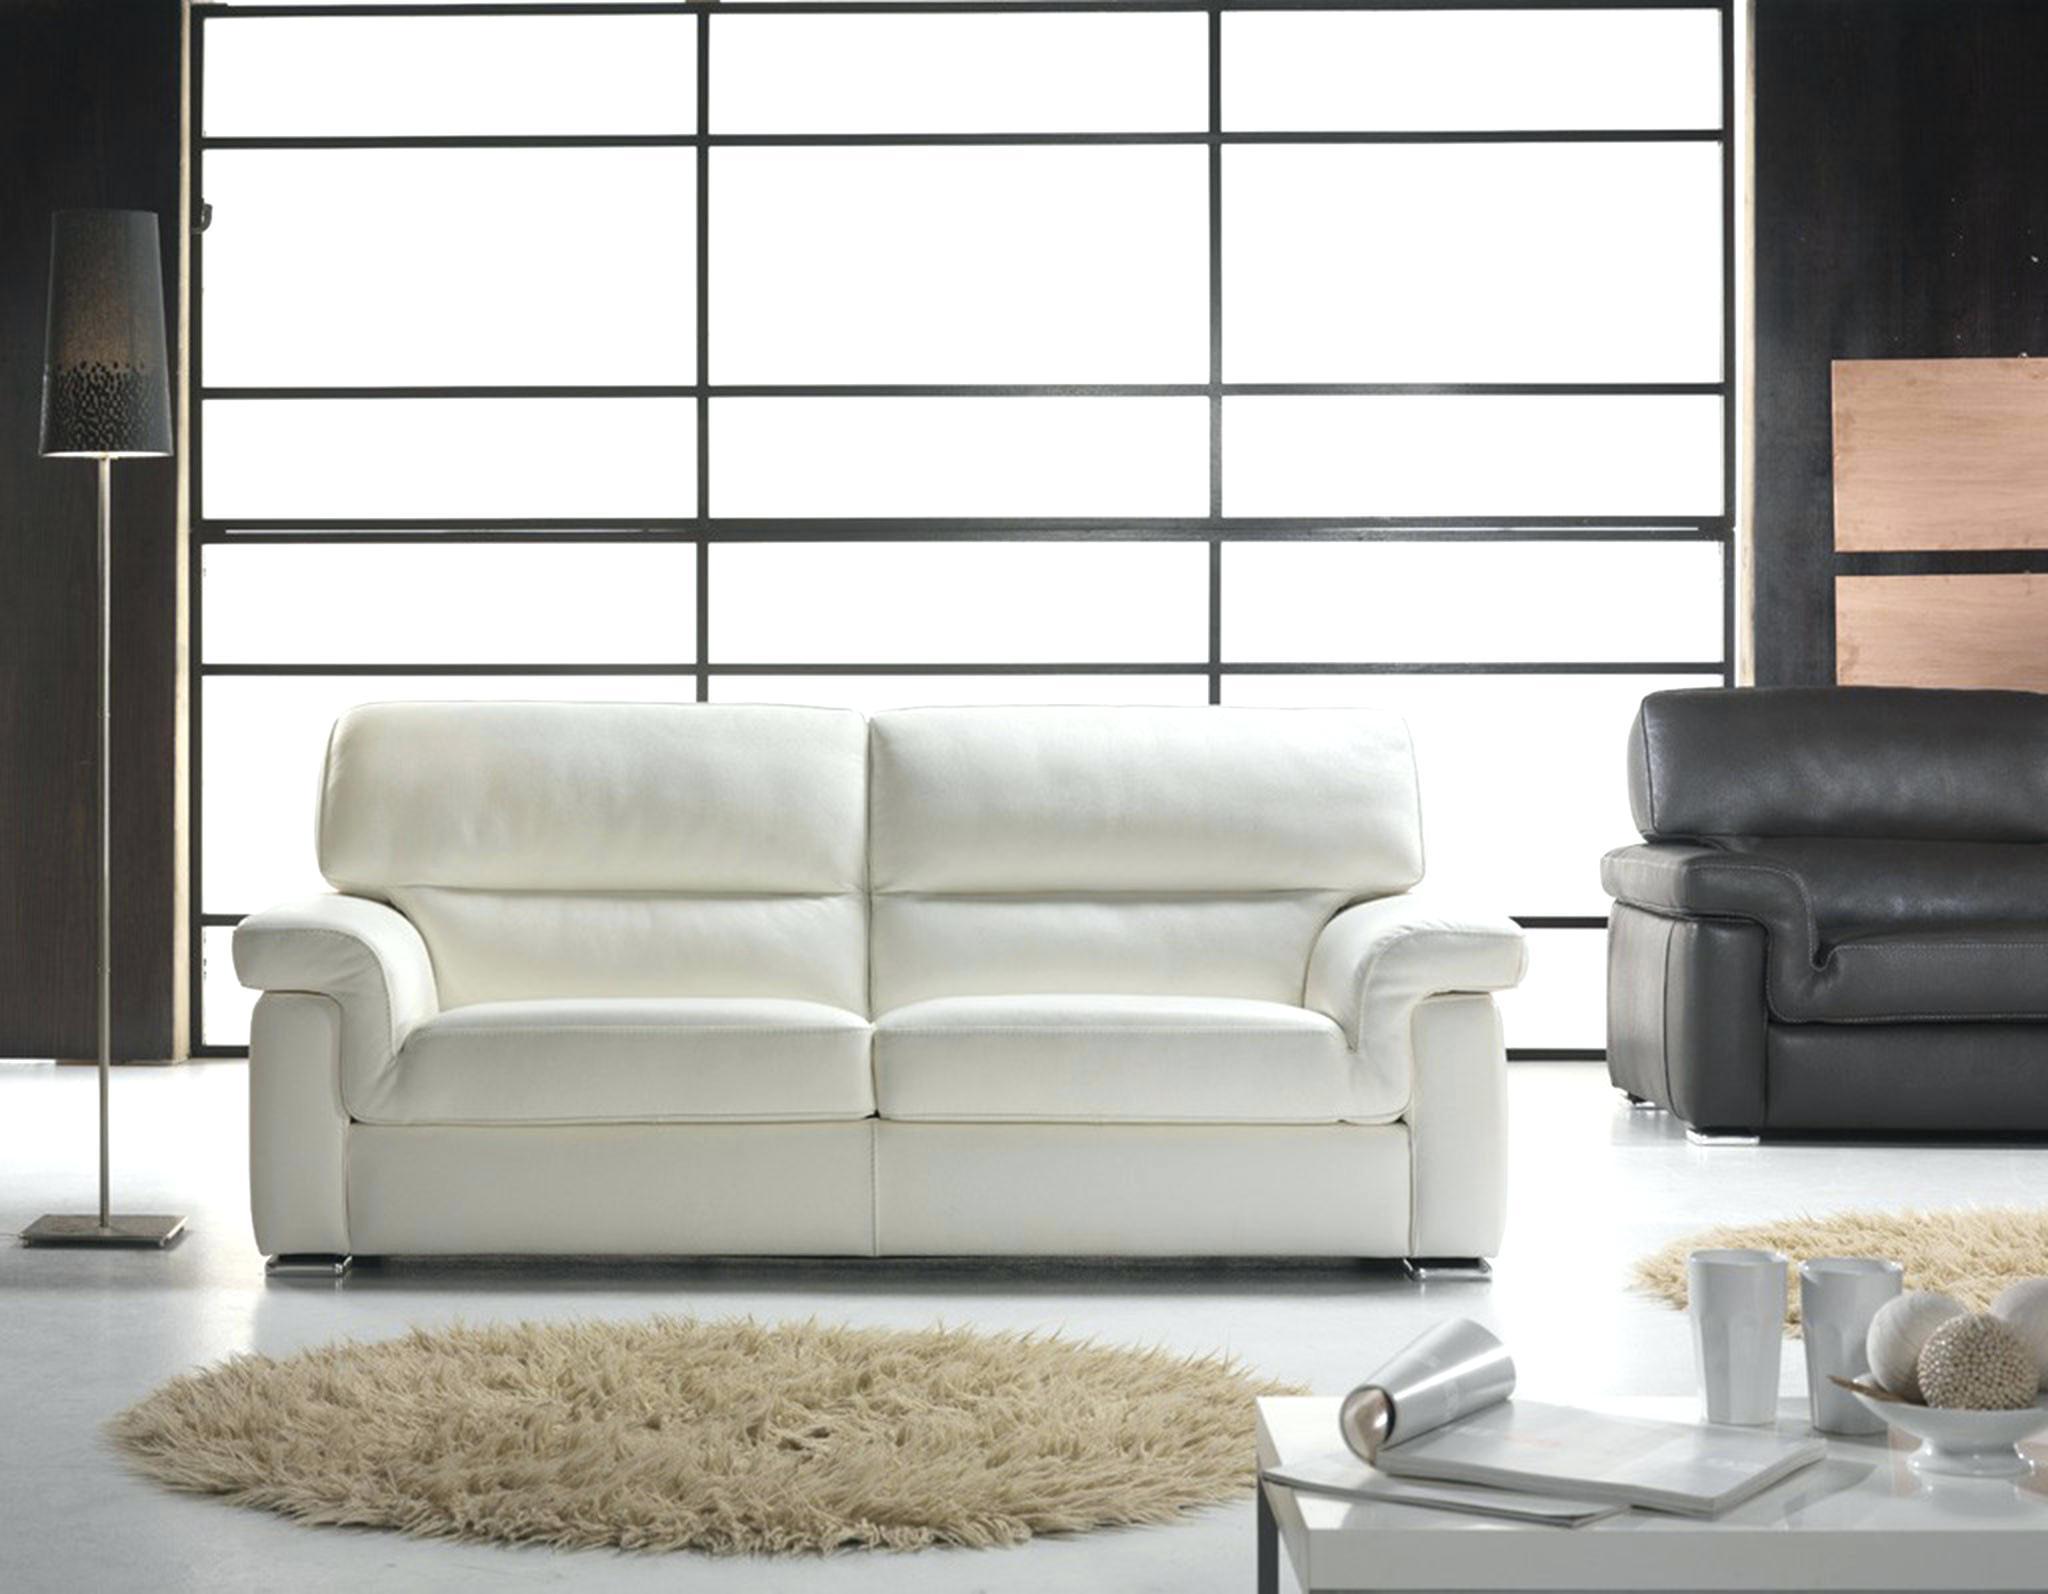 Canape solde Ikea Impressionnant Photographie Canap Italien Pas Cher 35 Avec Jobbuddy Co Page 57 Canape D Angle